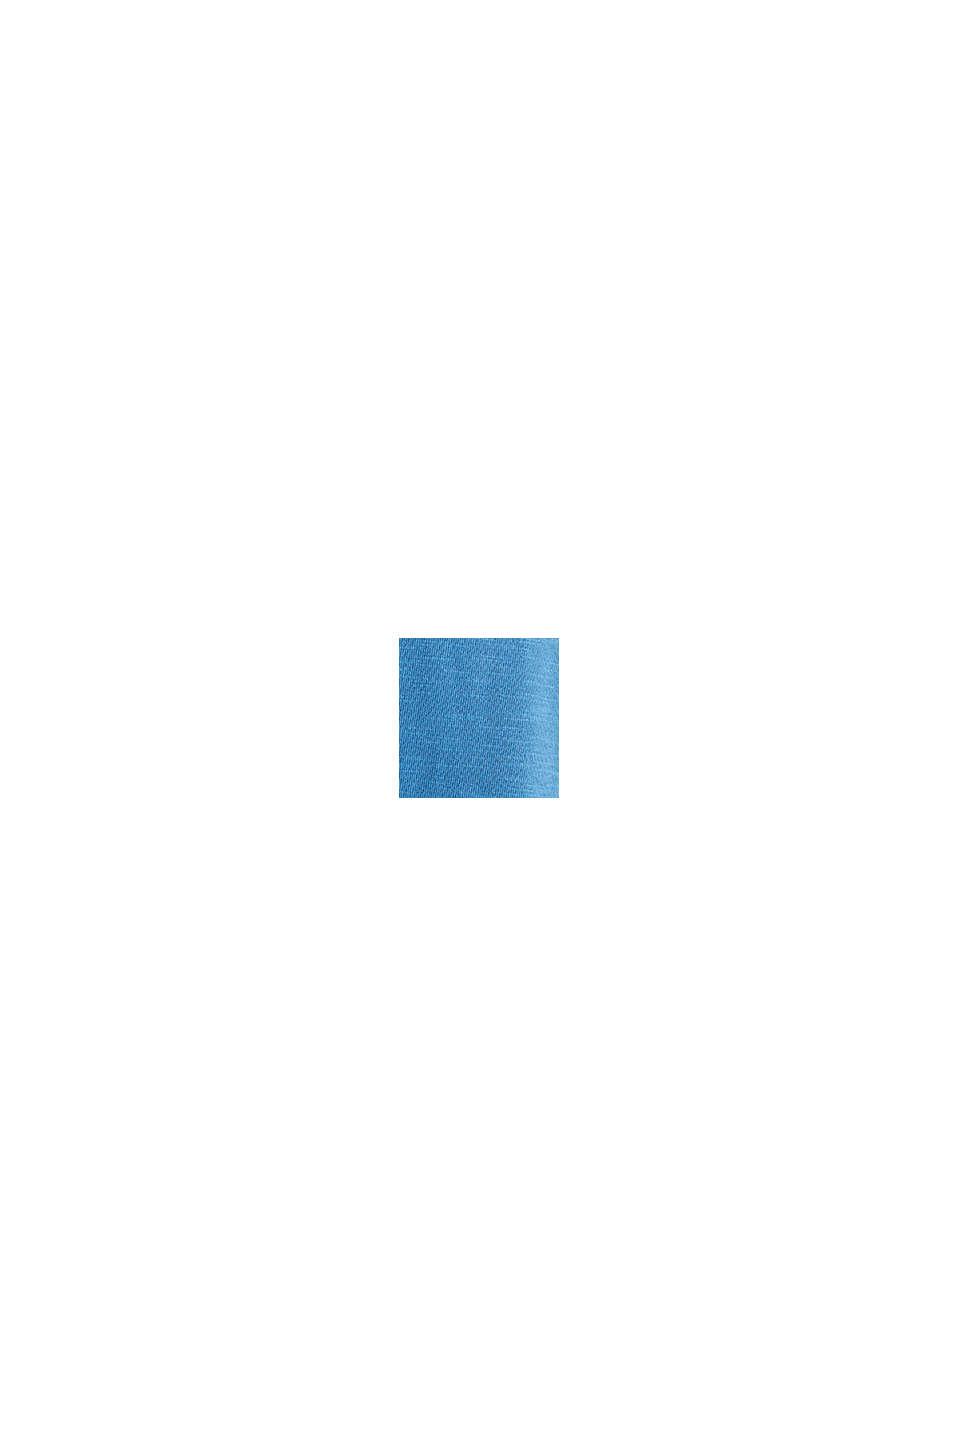 Jersey-Rock aus 100% Organic Cotton, BRIGHT BLUE, swatch